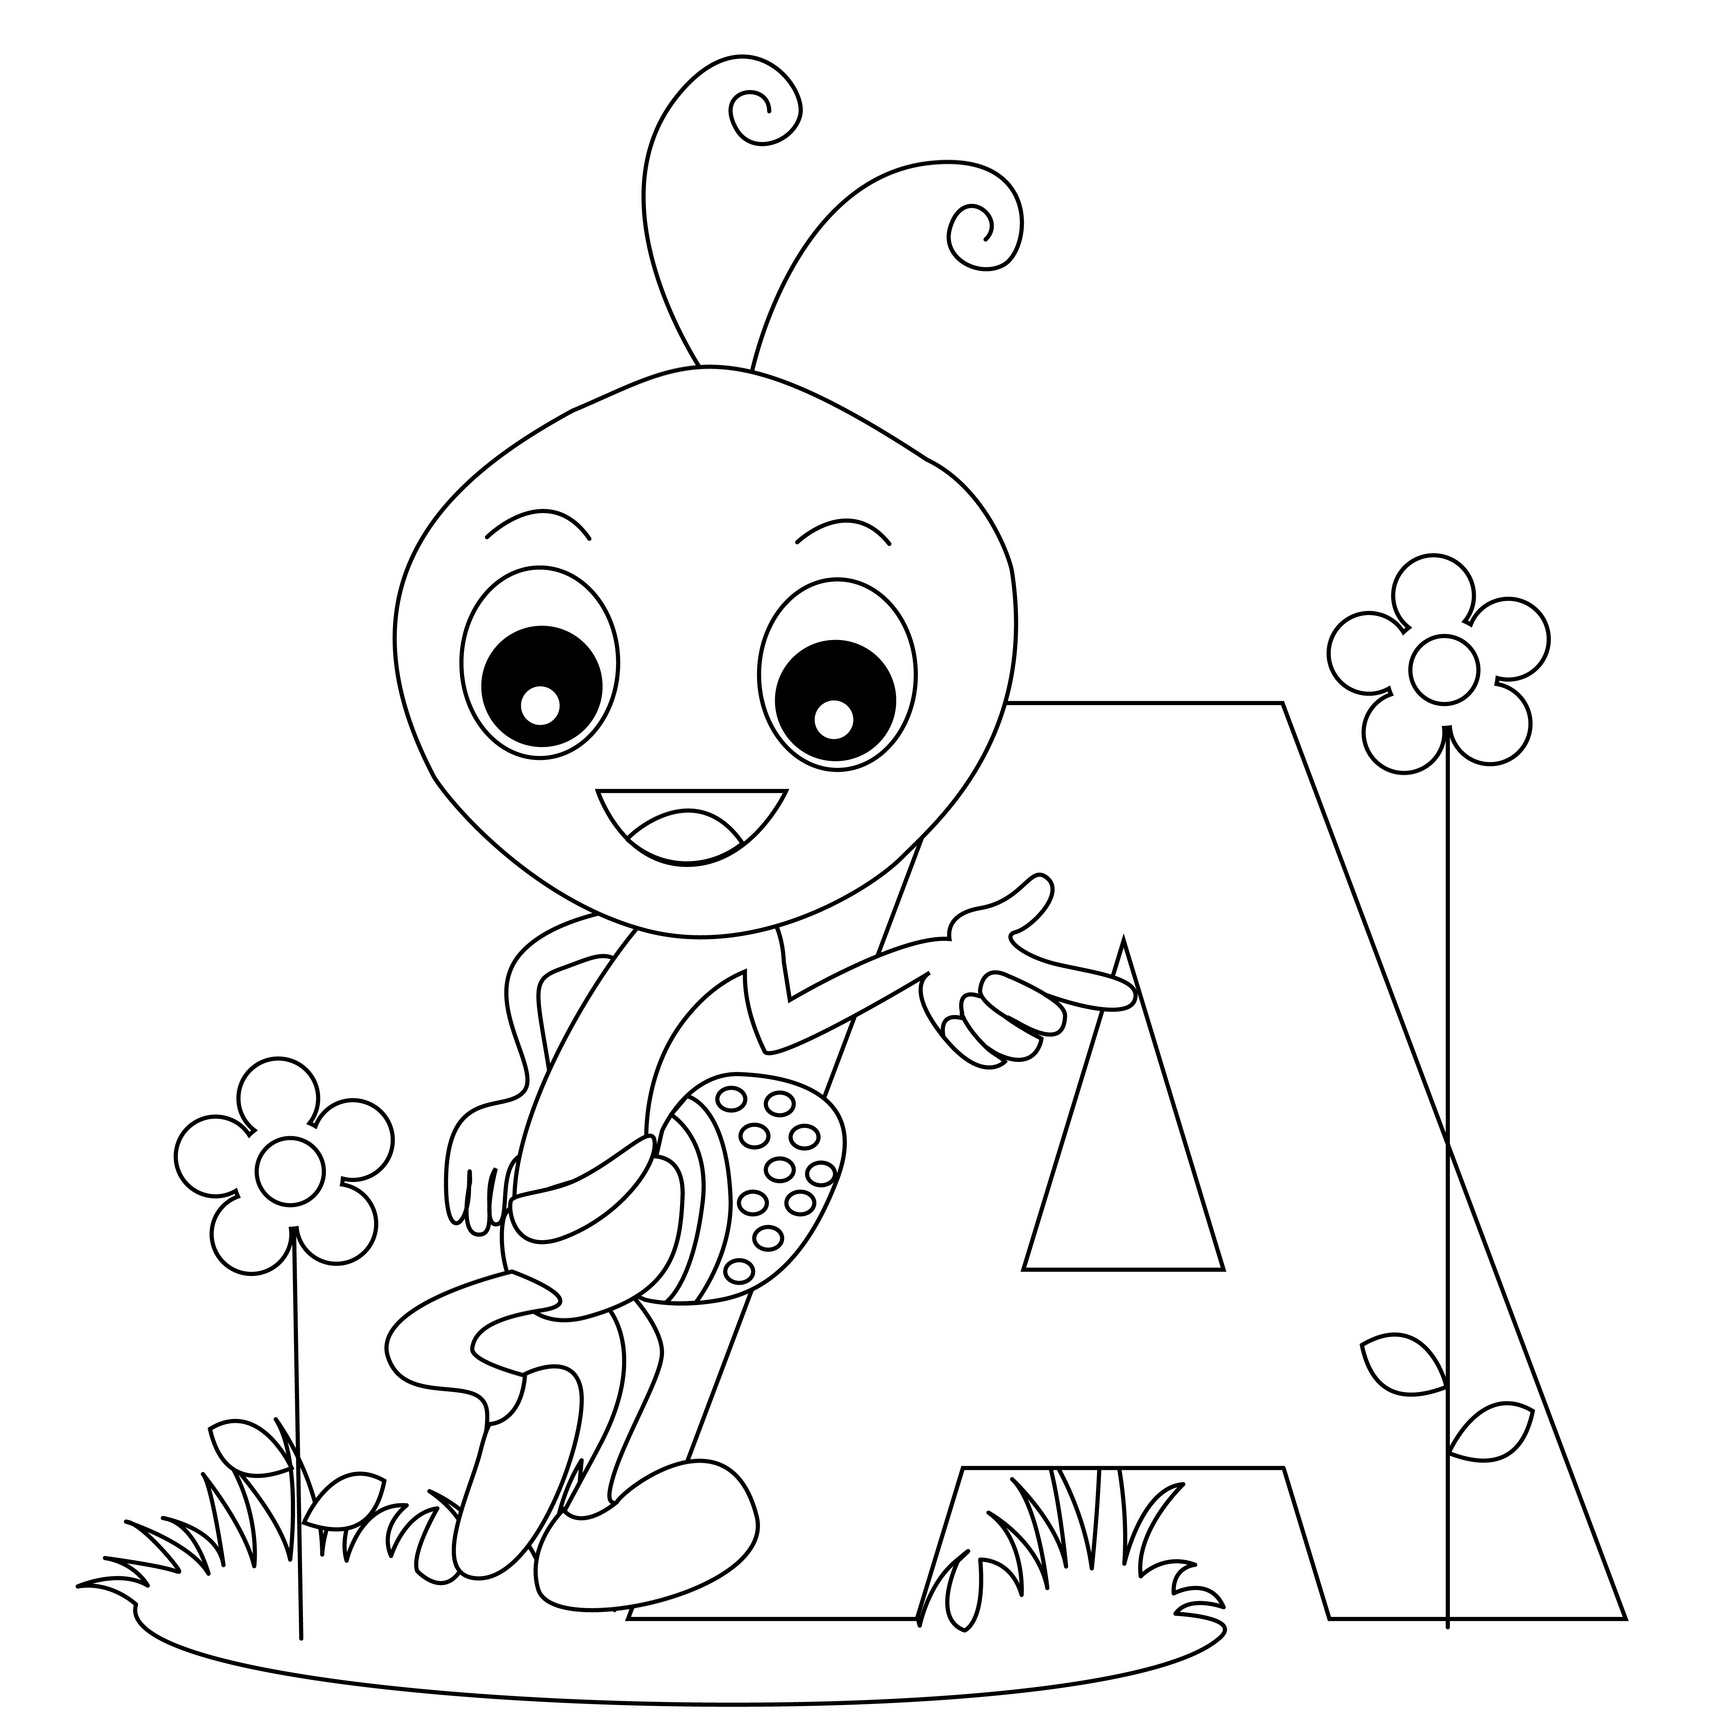 1732x1732 Printable Coloring Pages Alphabet Letters New Kids Abc Toys Line